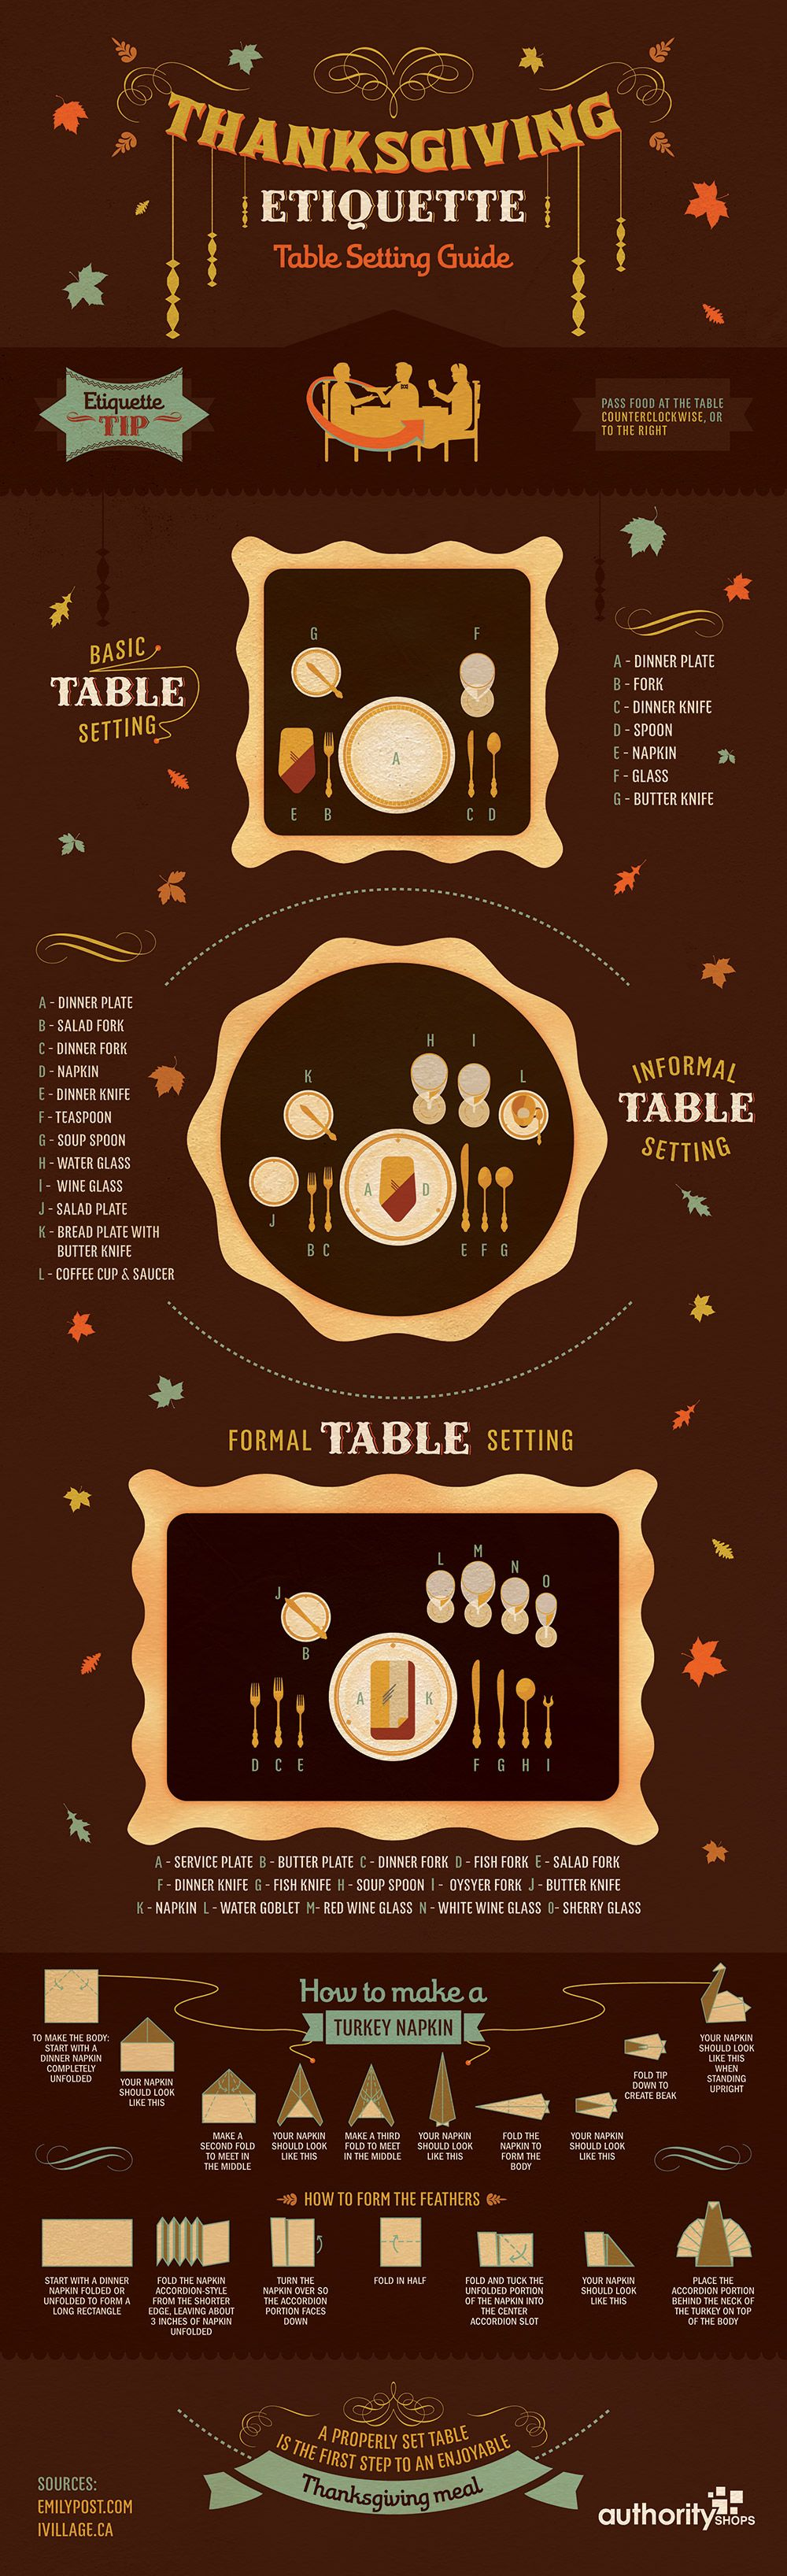 Remodelaholic   Day 11; Happy Thanksgiving